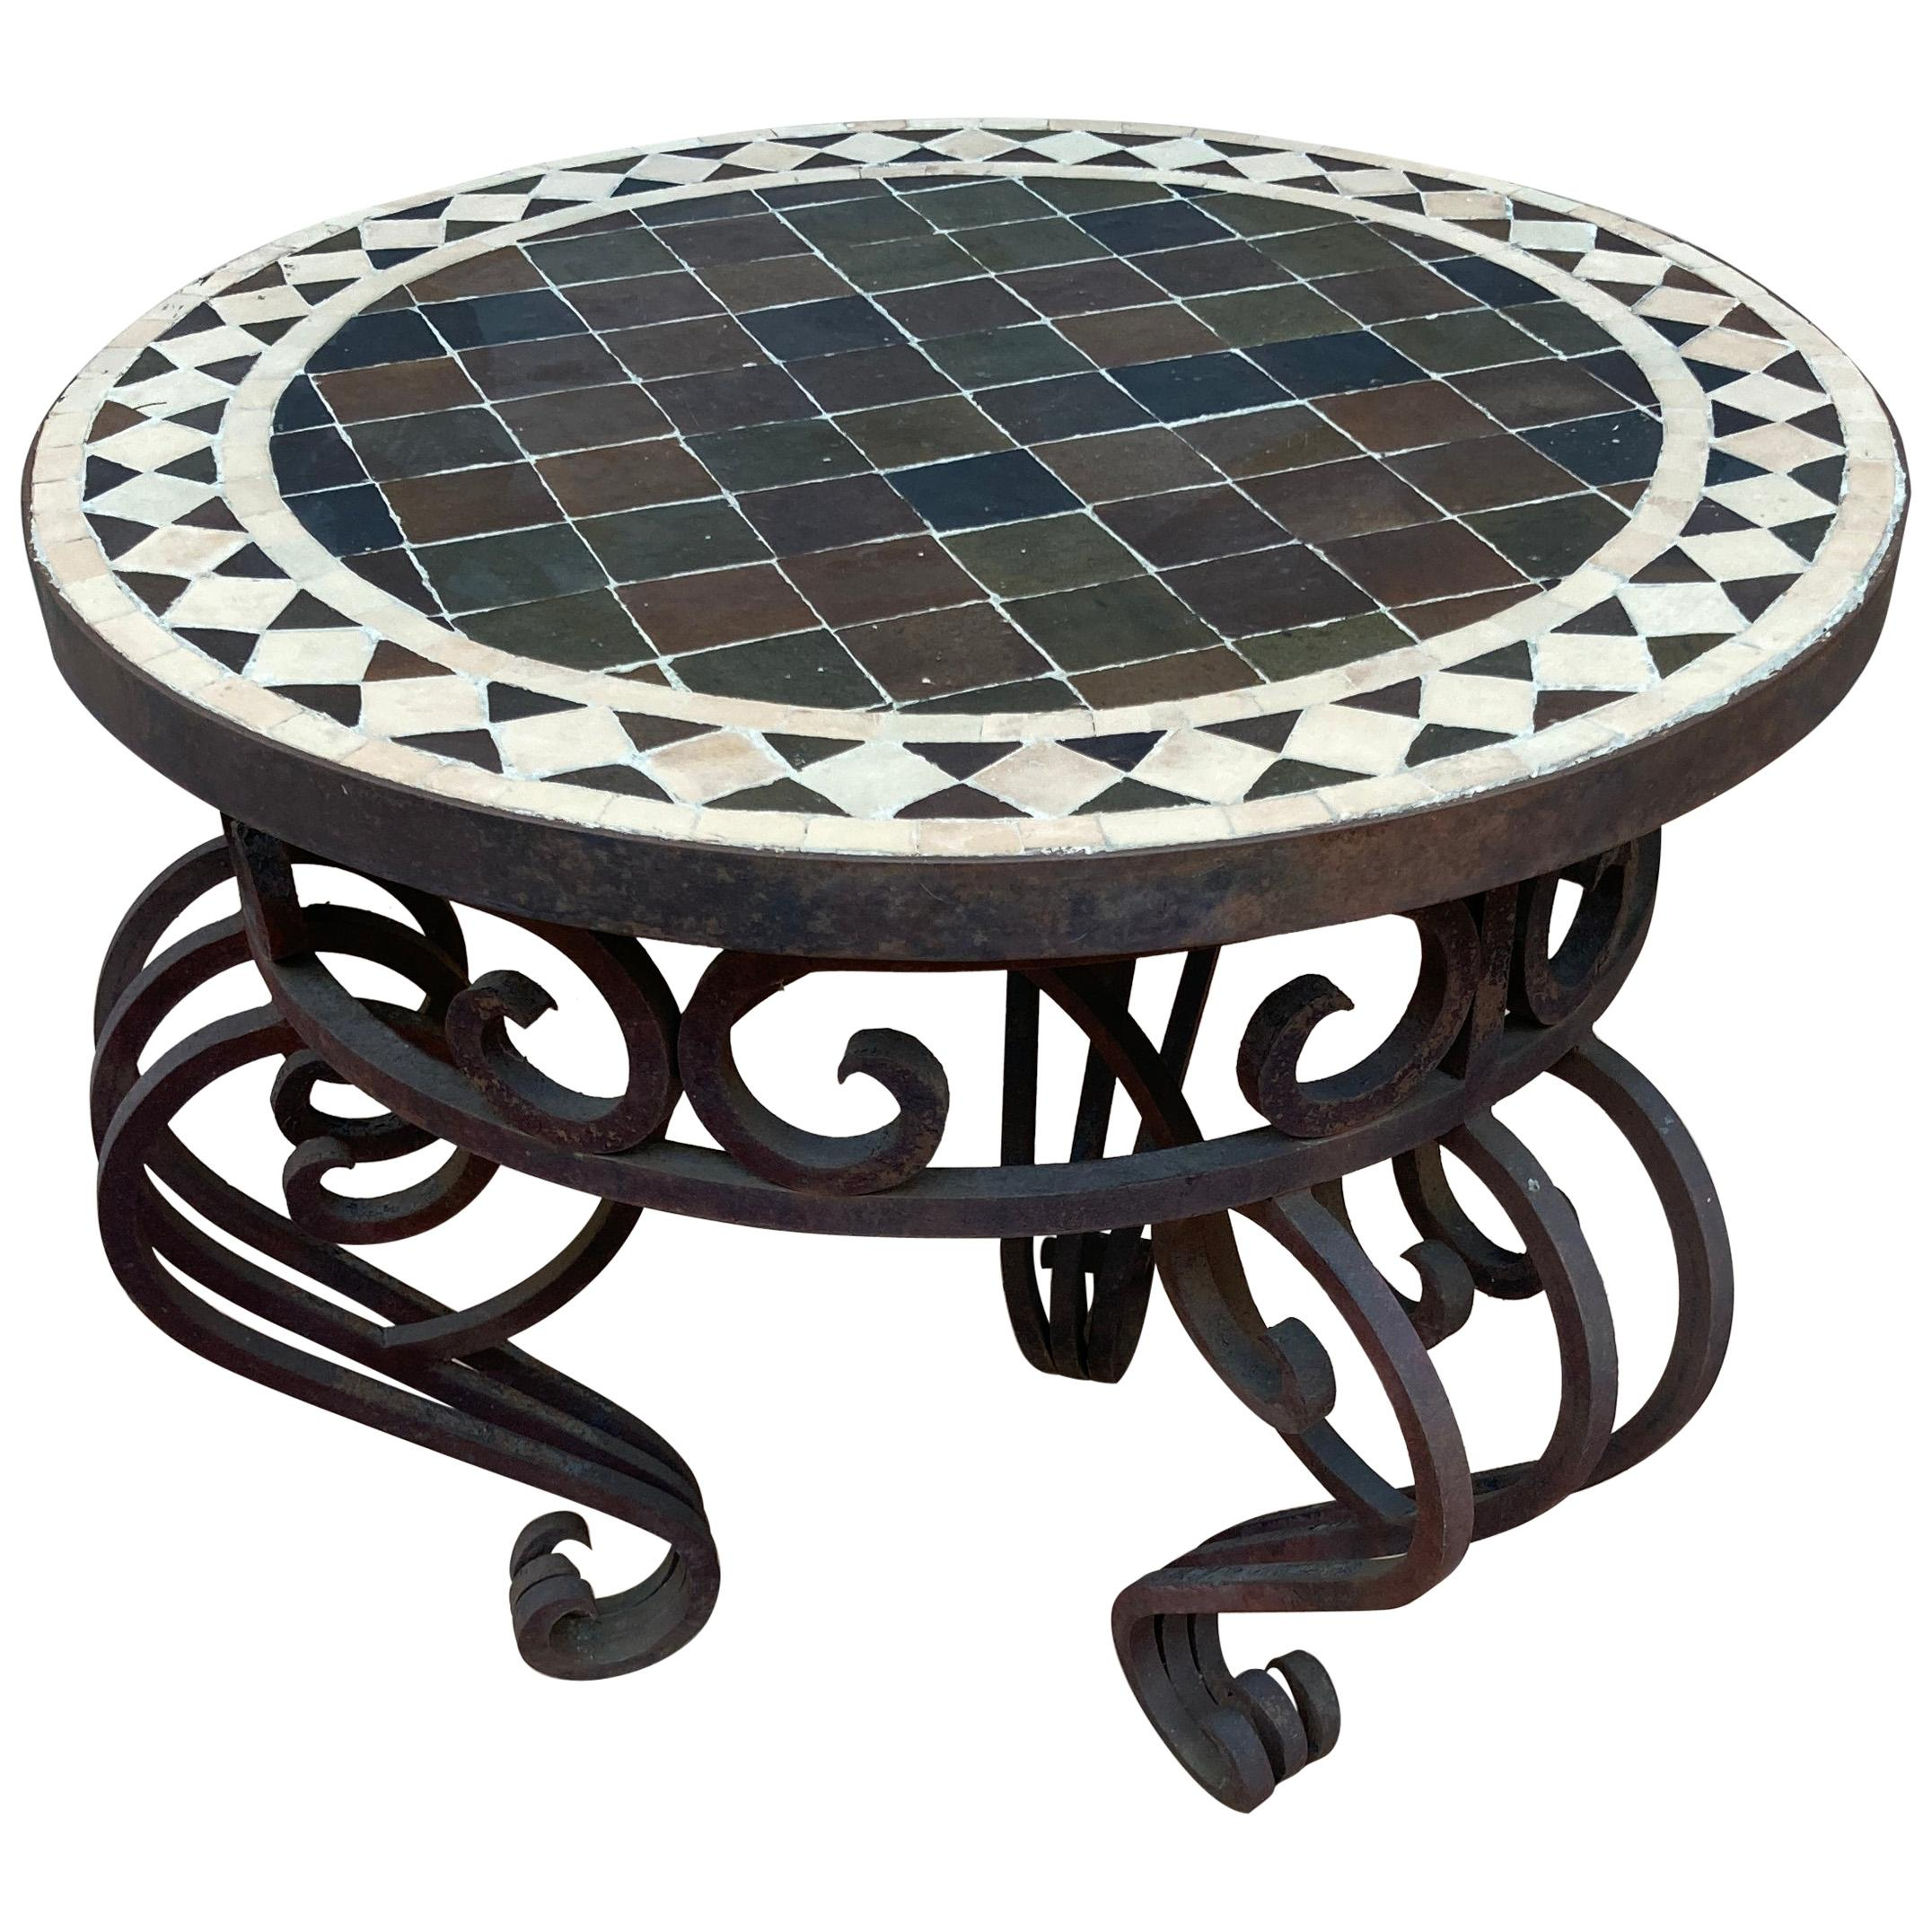 Moroccan Mosaic Tile Side Table